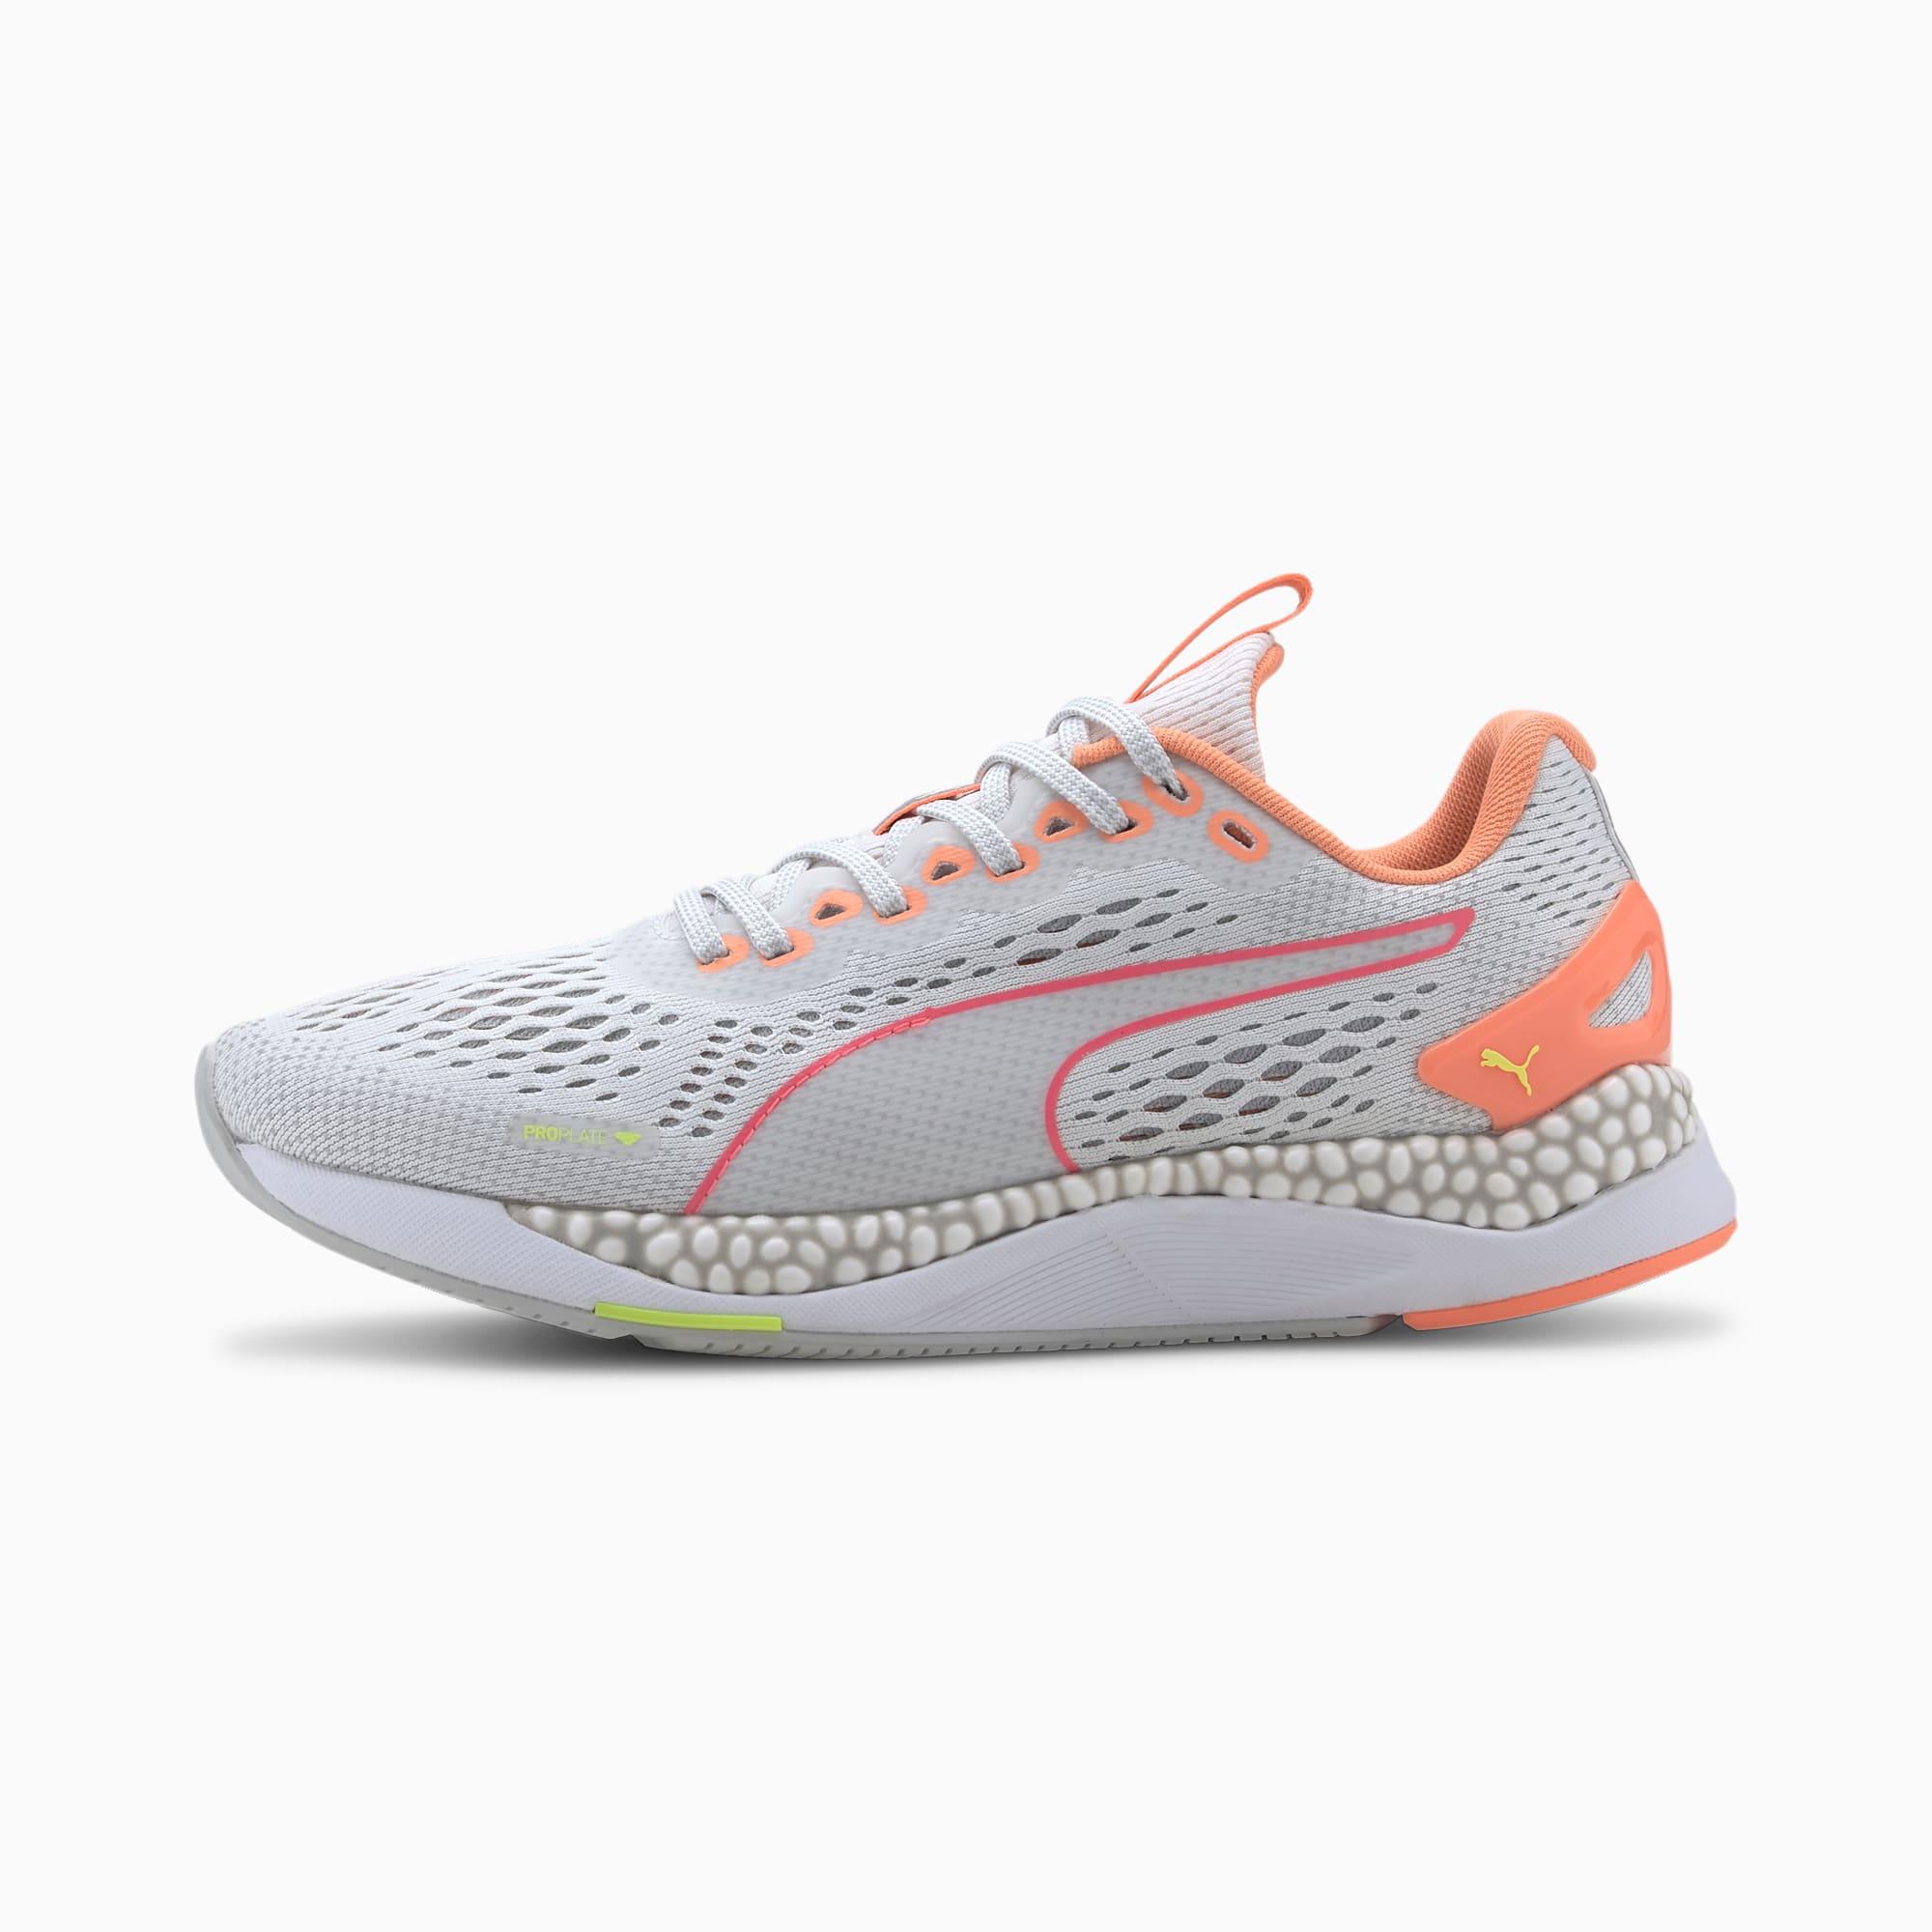 SPEED 600 2 Women's Running Shoes